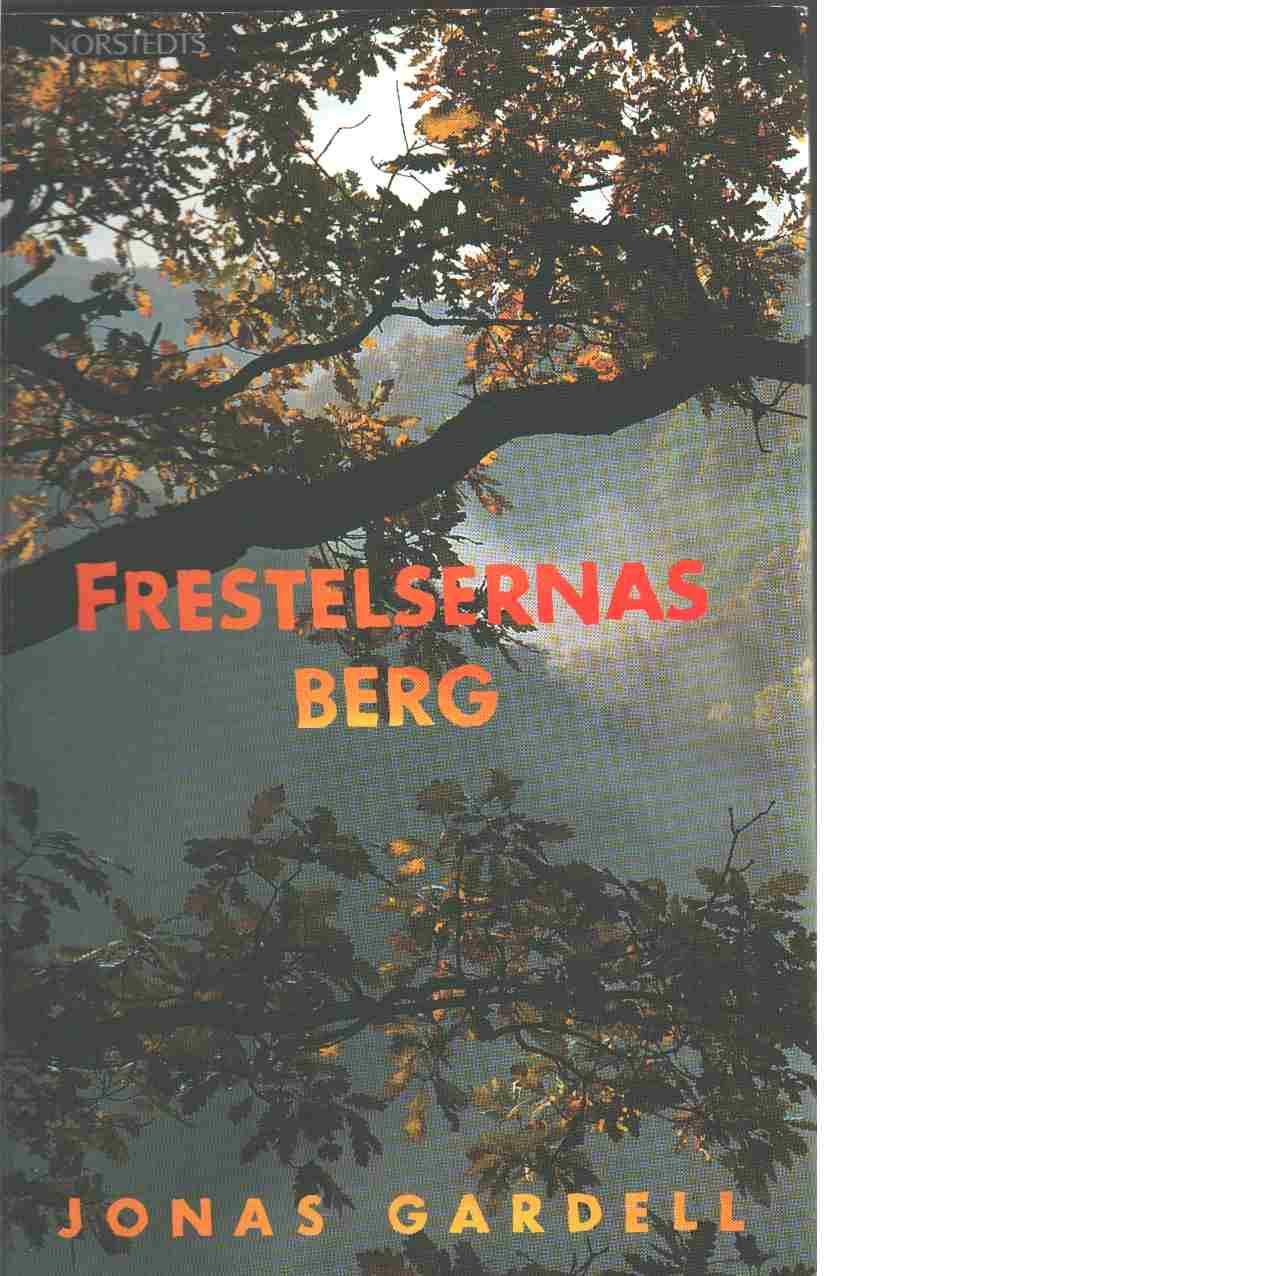 Frestelsernas berg - Gardell, Jonas